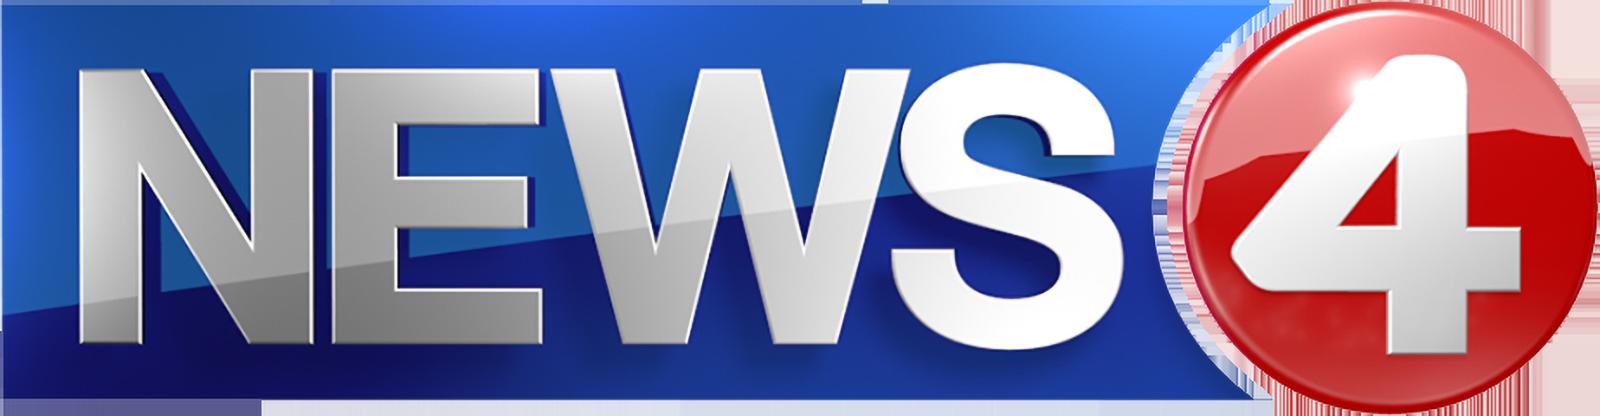 WIVB News Channel 4 Buffalo logo